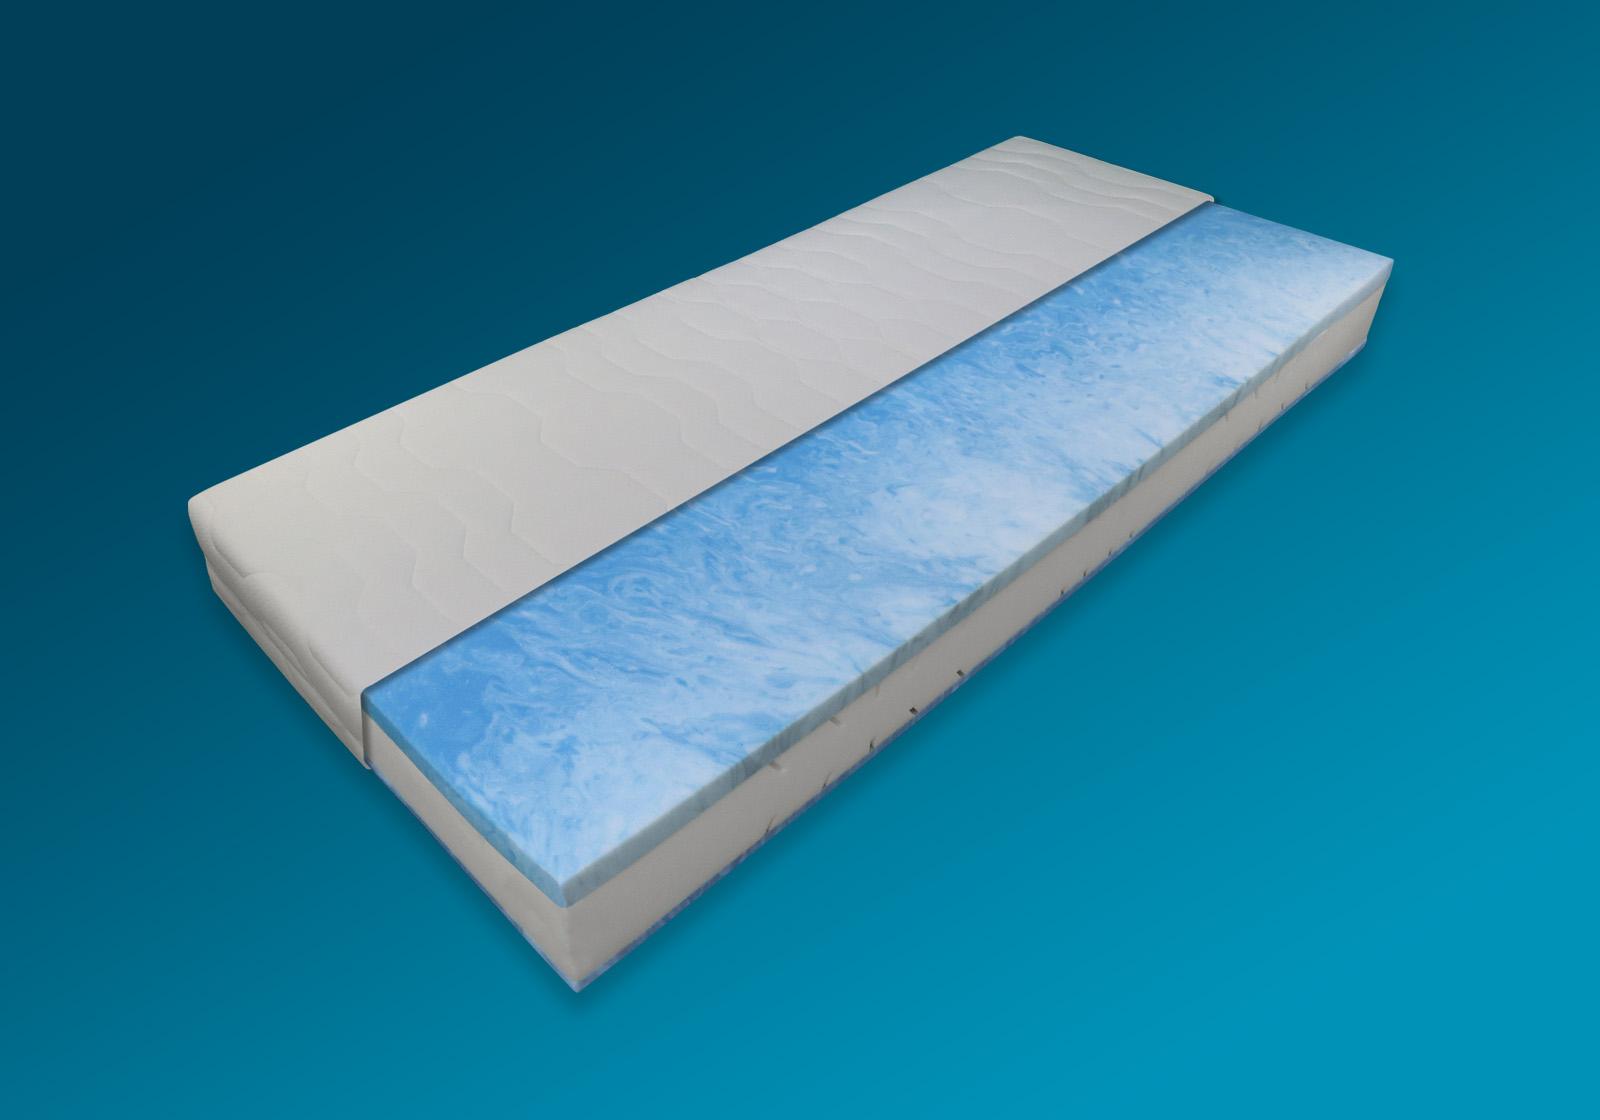 maxx 229 1382 160x200 kaltschaum gel h3 h he 21 cm ebay. Black Bedroom Furniture Sets. Home Design Ideas